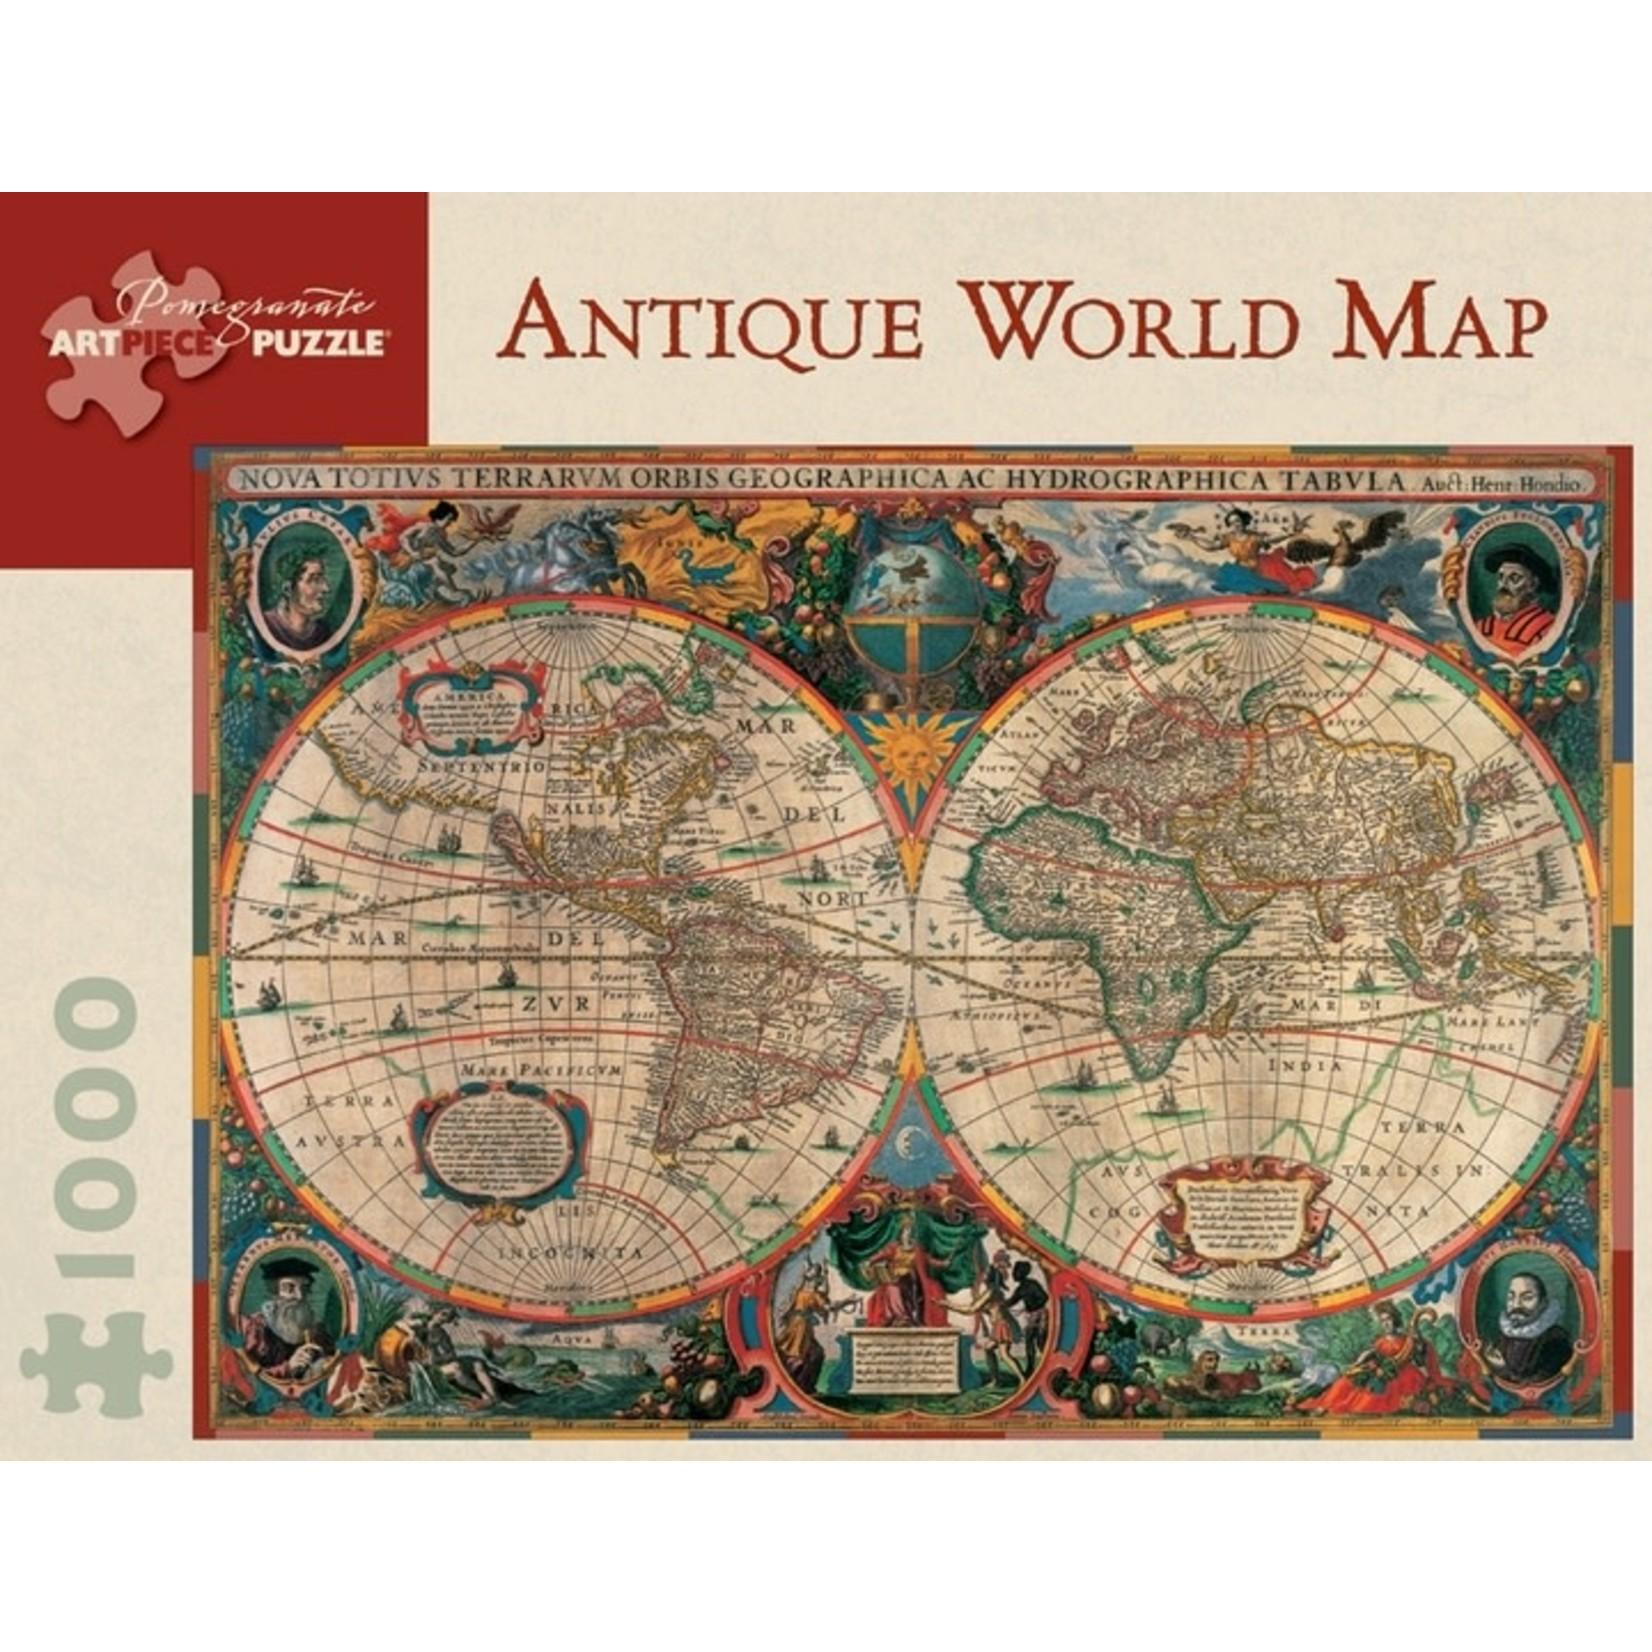 Pomegranate Antique World Map - 1000 Piece Jigsaw Puzzle